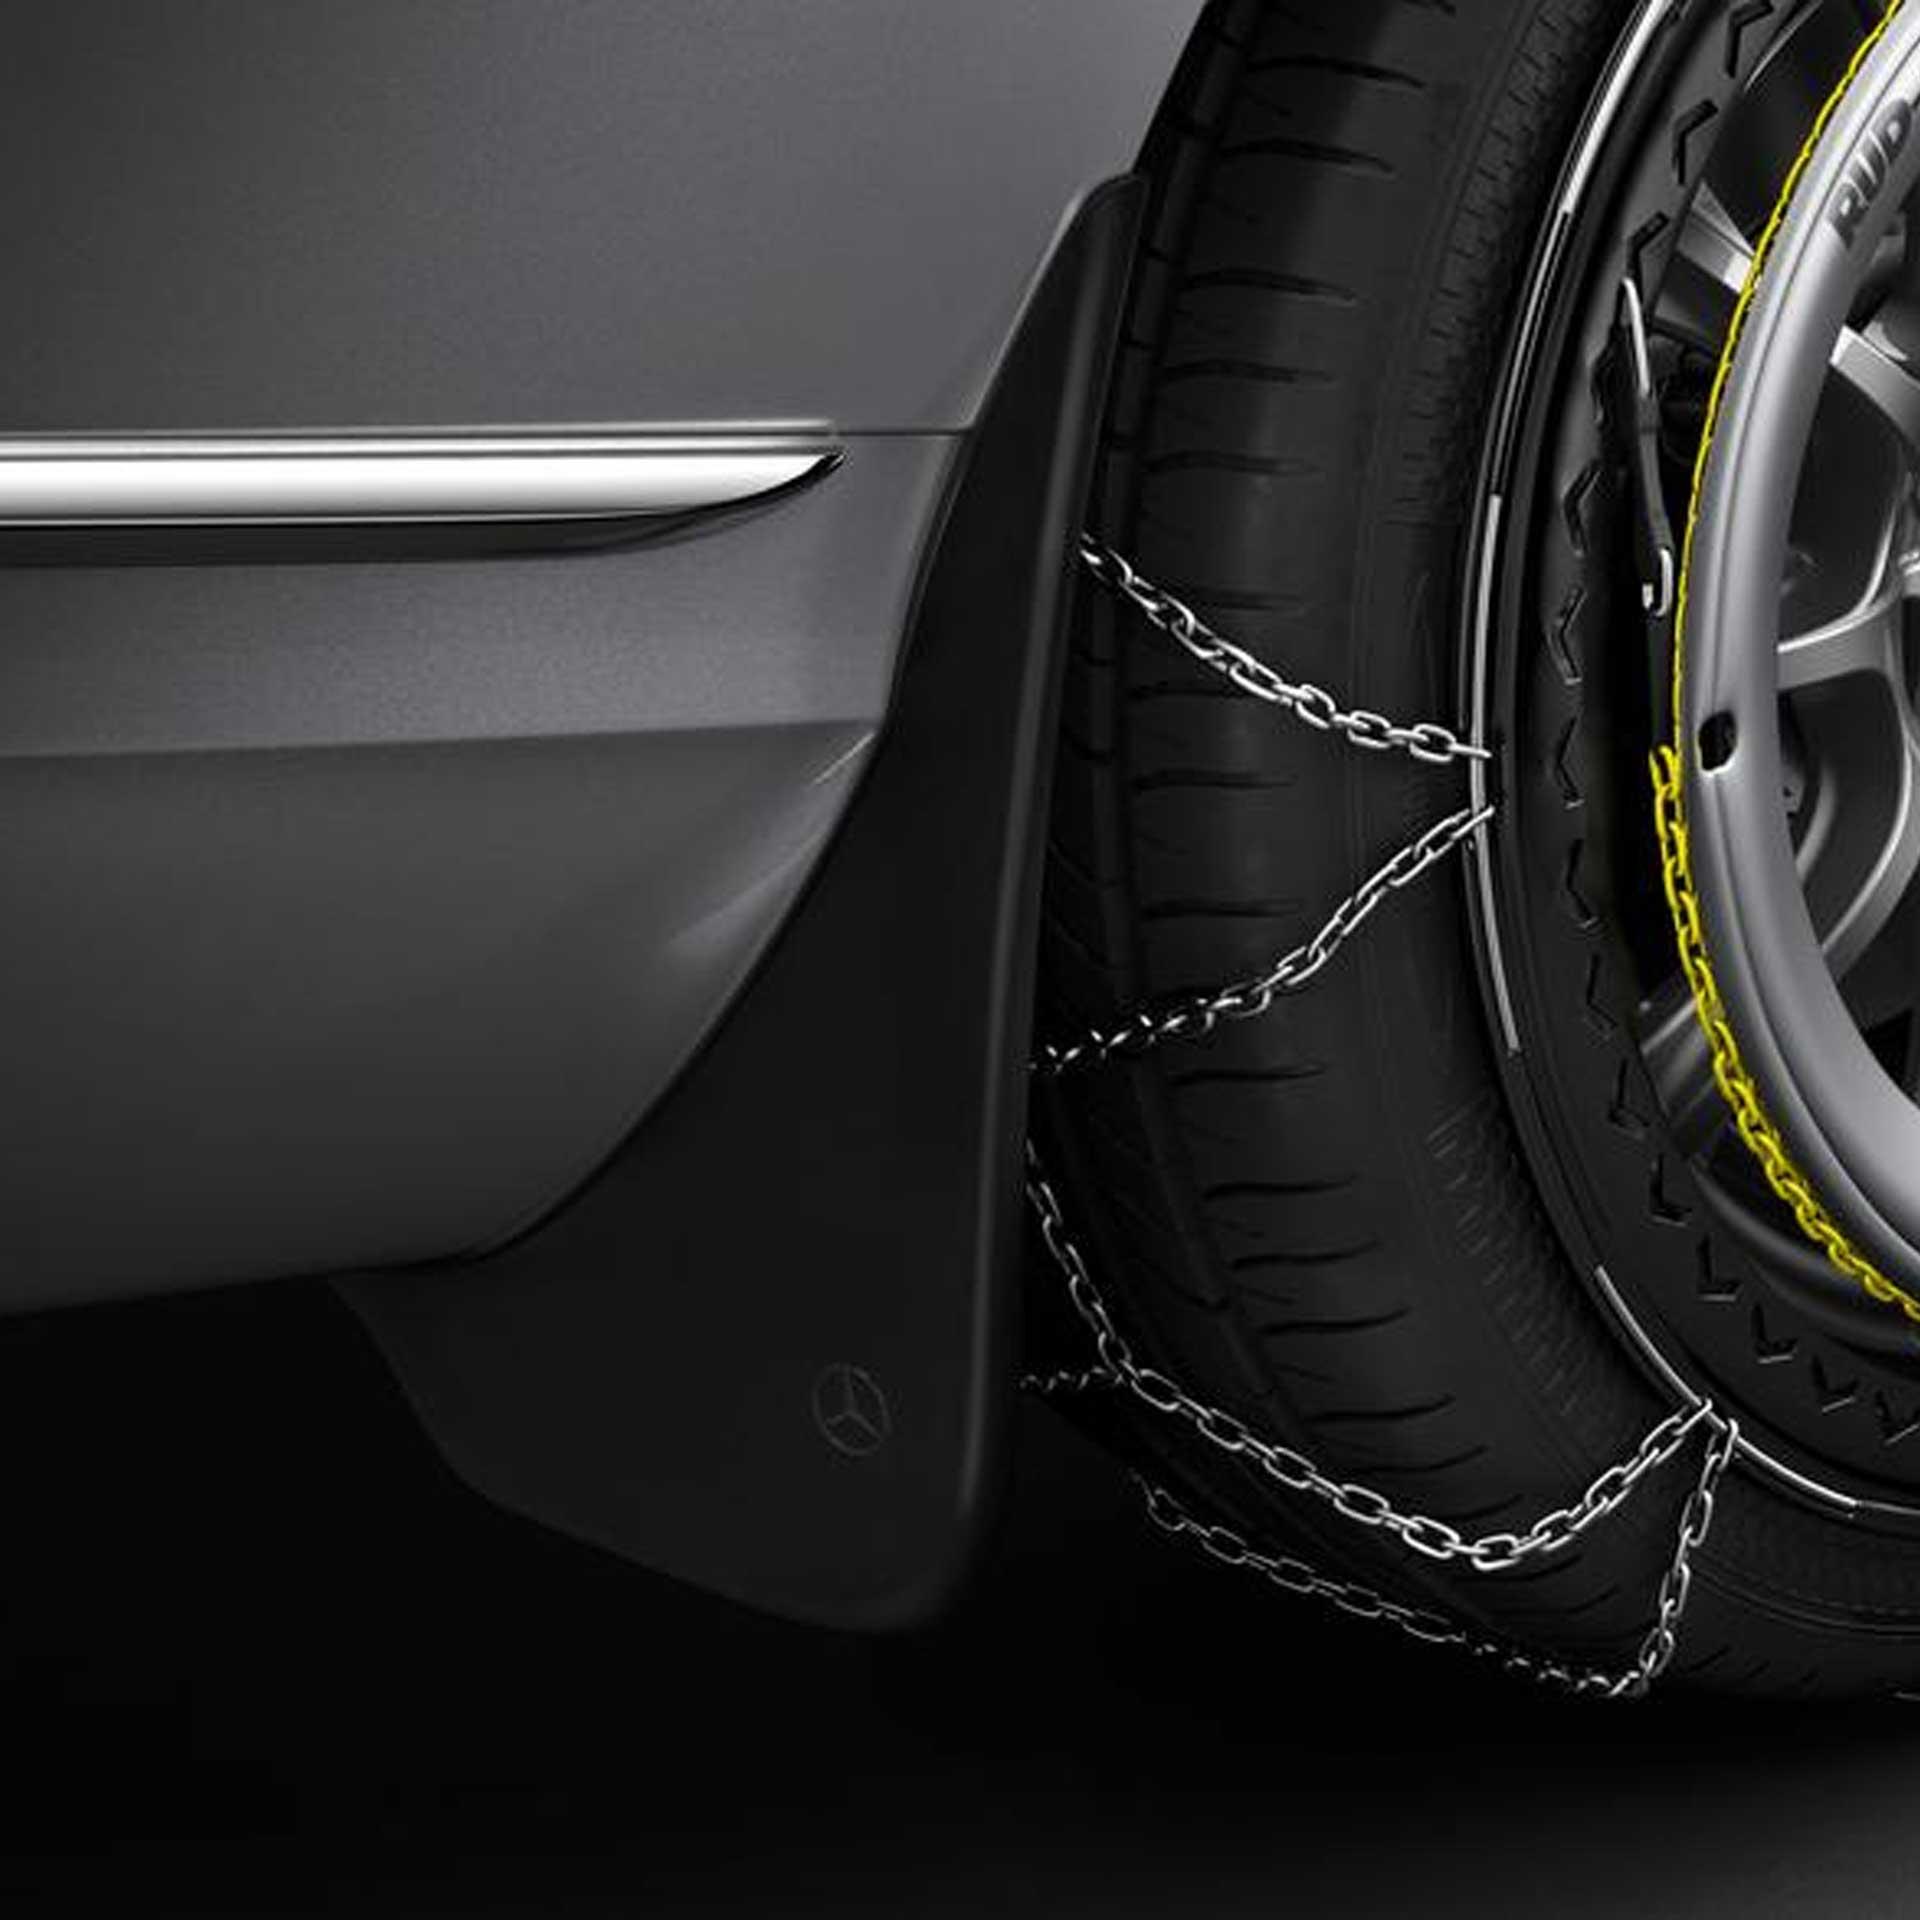 Mercedes-Benz Schmutzfänger C-Klasse 206 Satz hinten schwarz